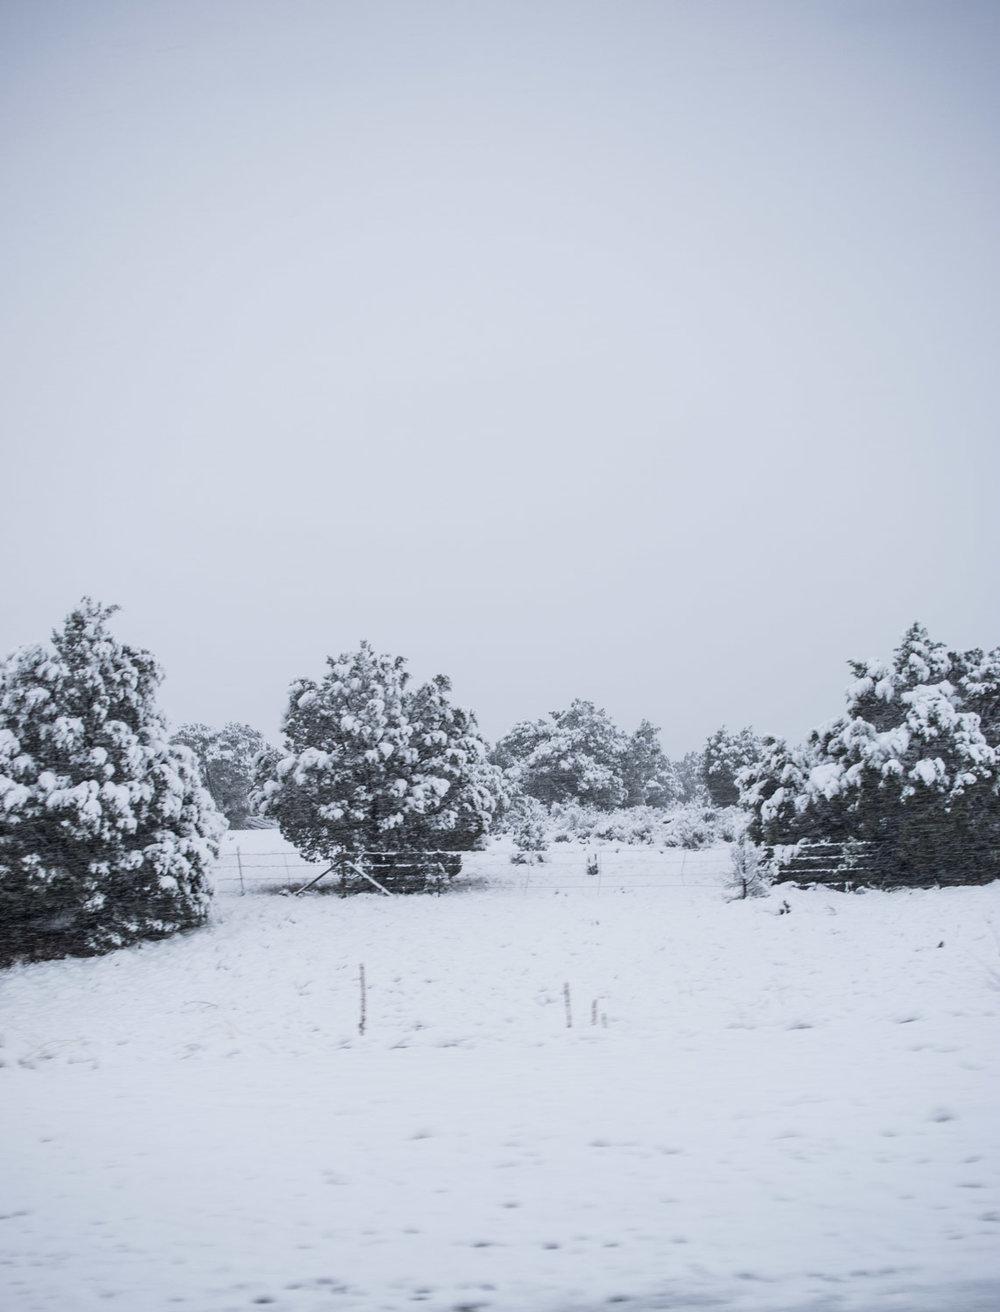 amaris-woo-photography-snow-arizona